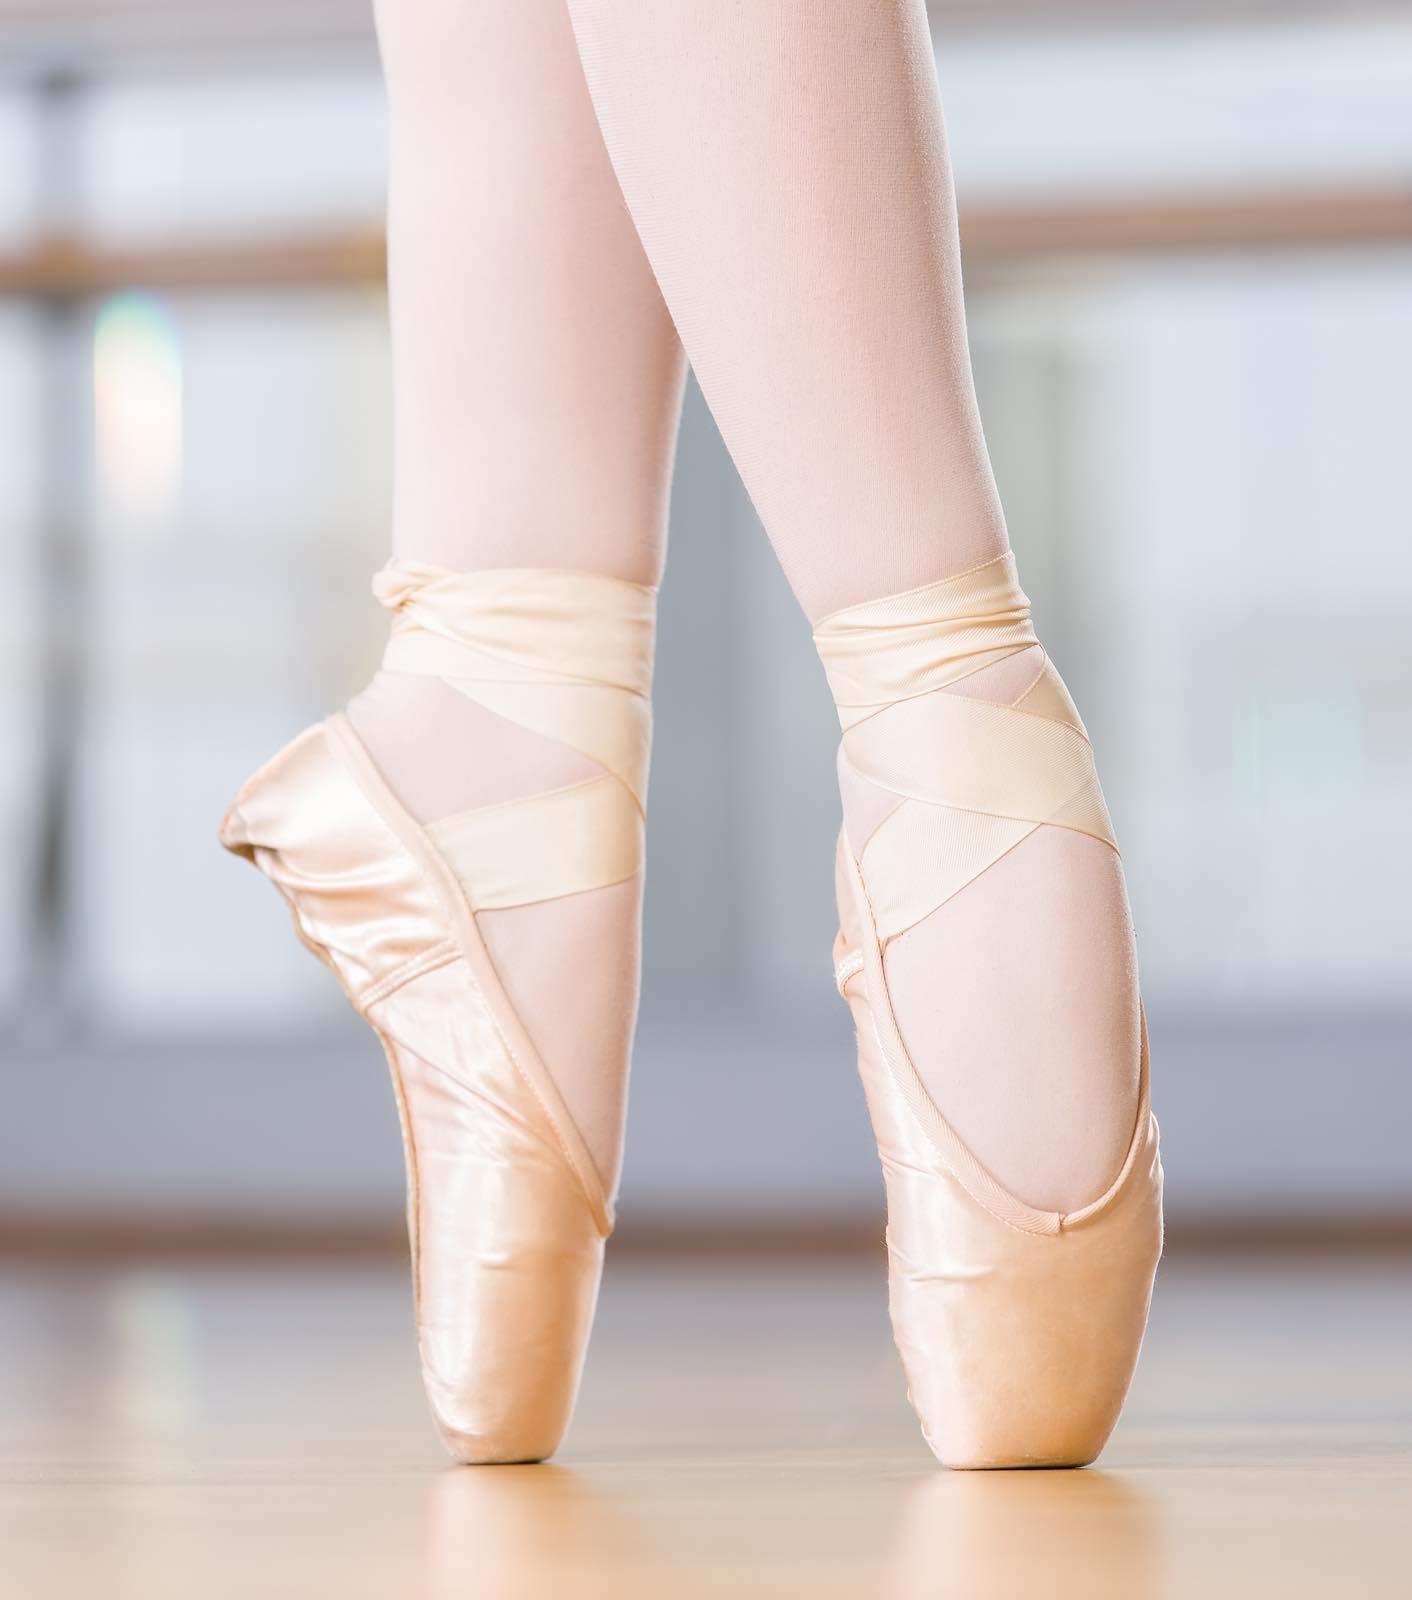 Ballerina In The Dancing Hall